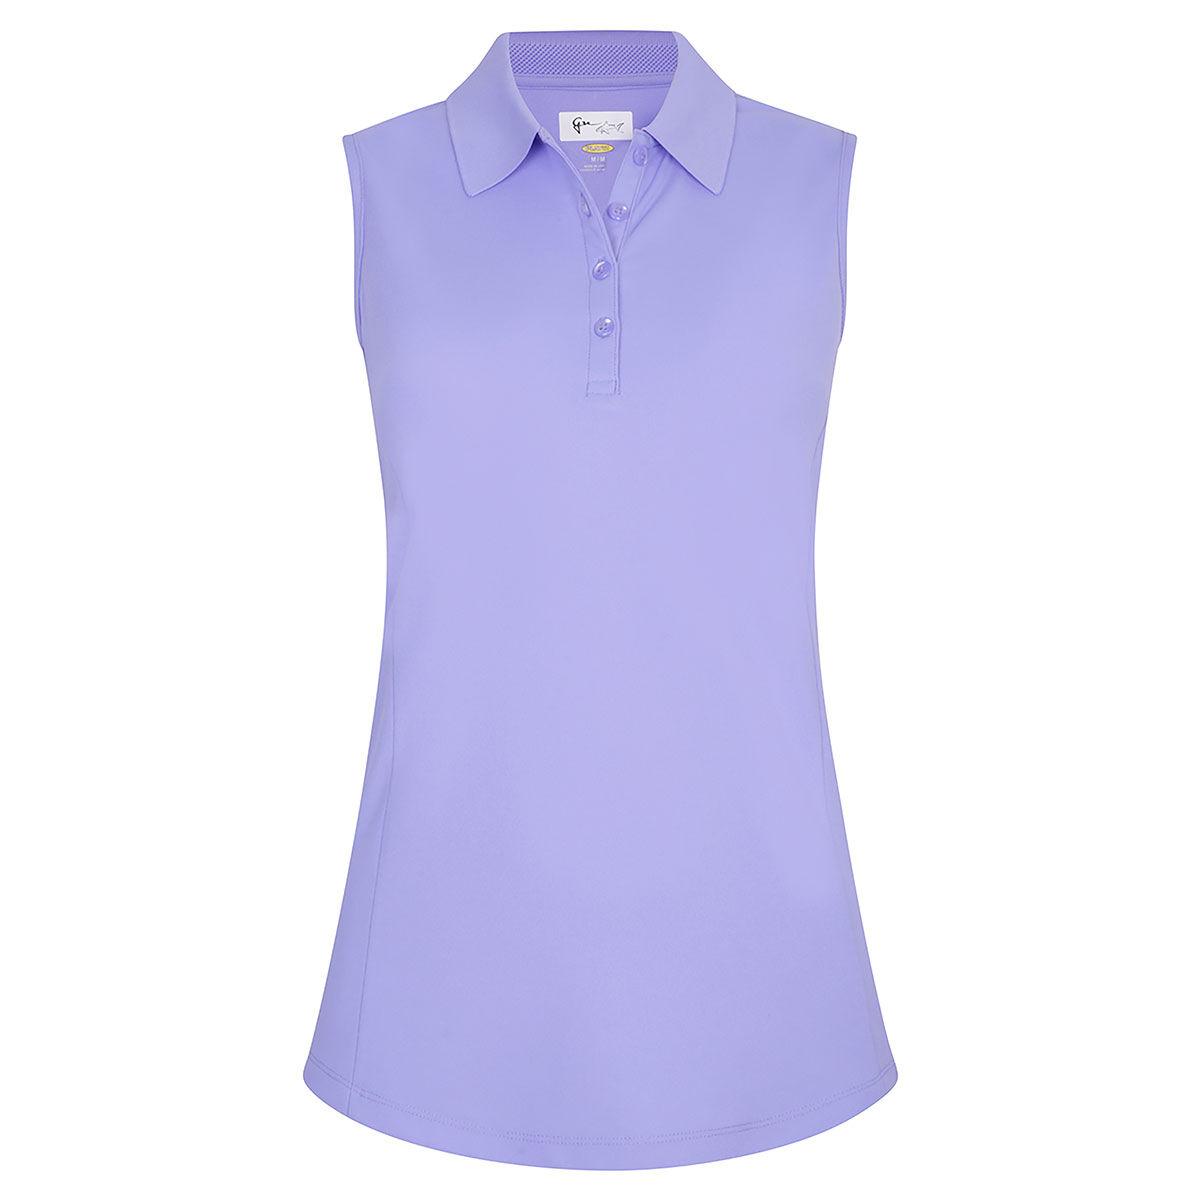 Greg Norman Apex Sleeveless Womens Golf Polo Shirt, Female, Large, Indigo   American Golf